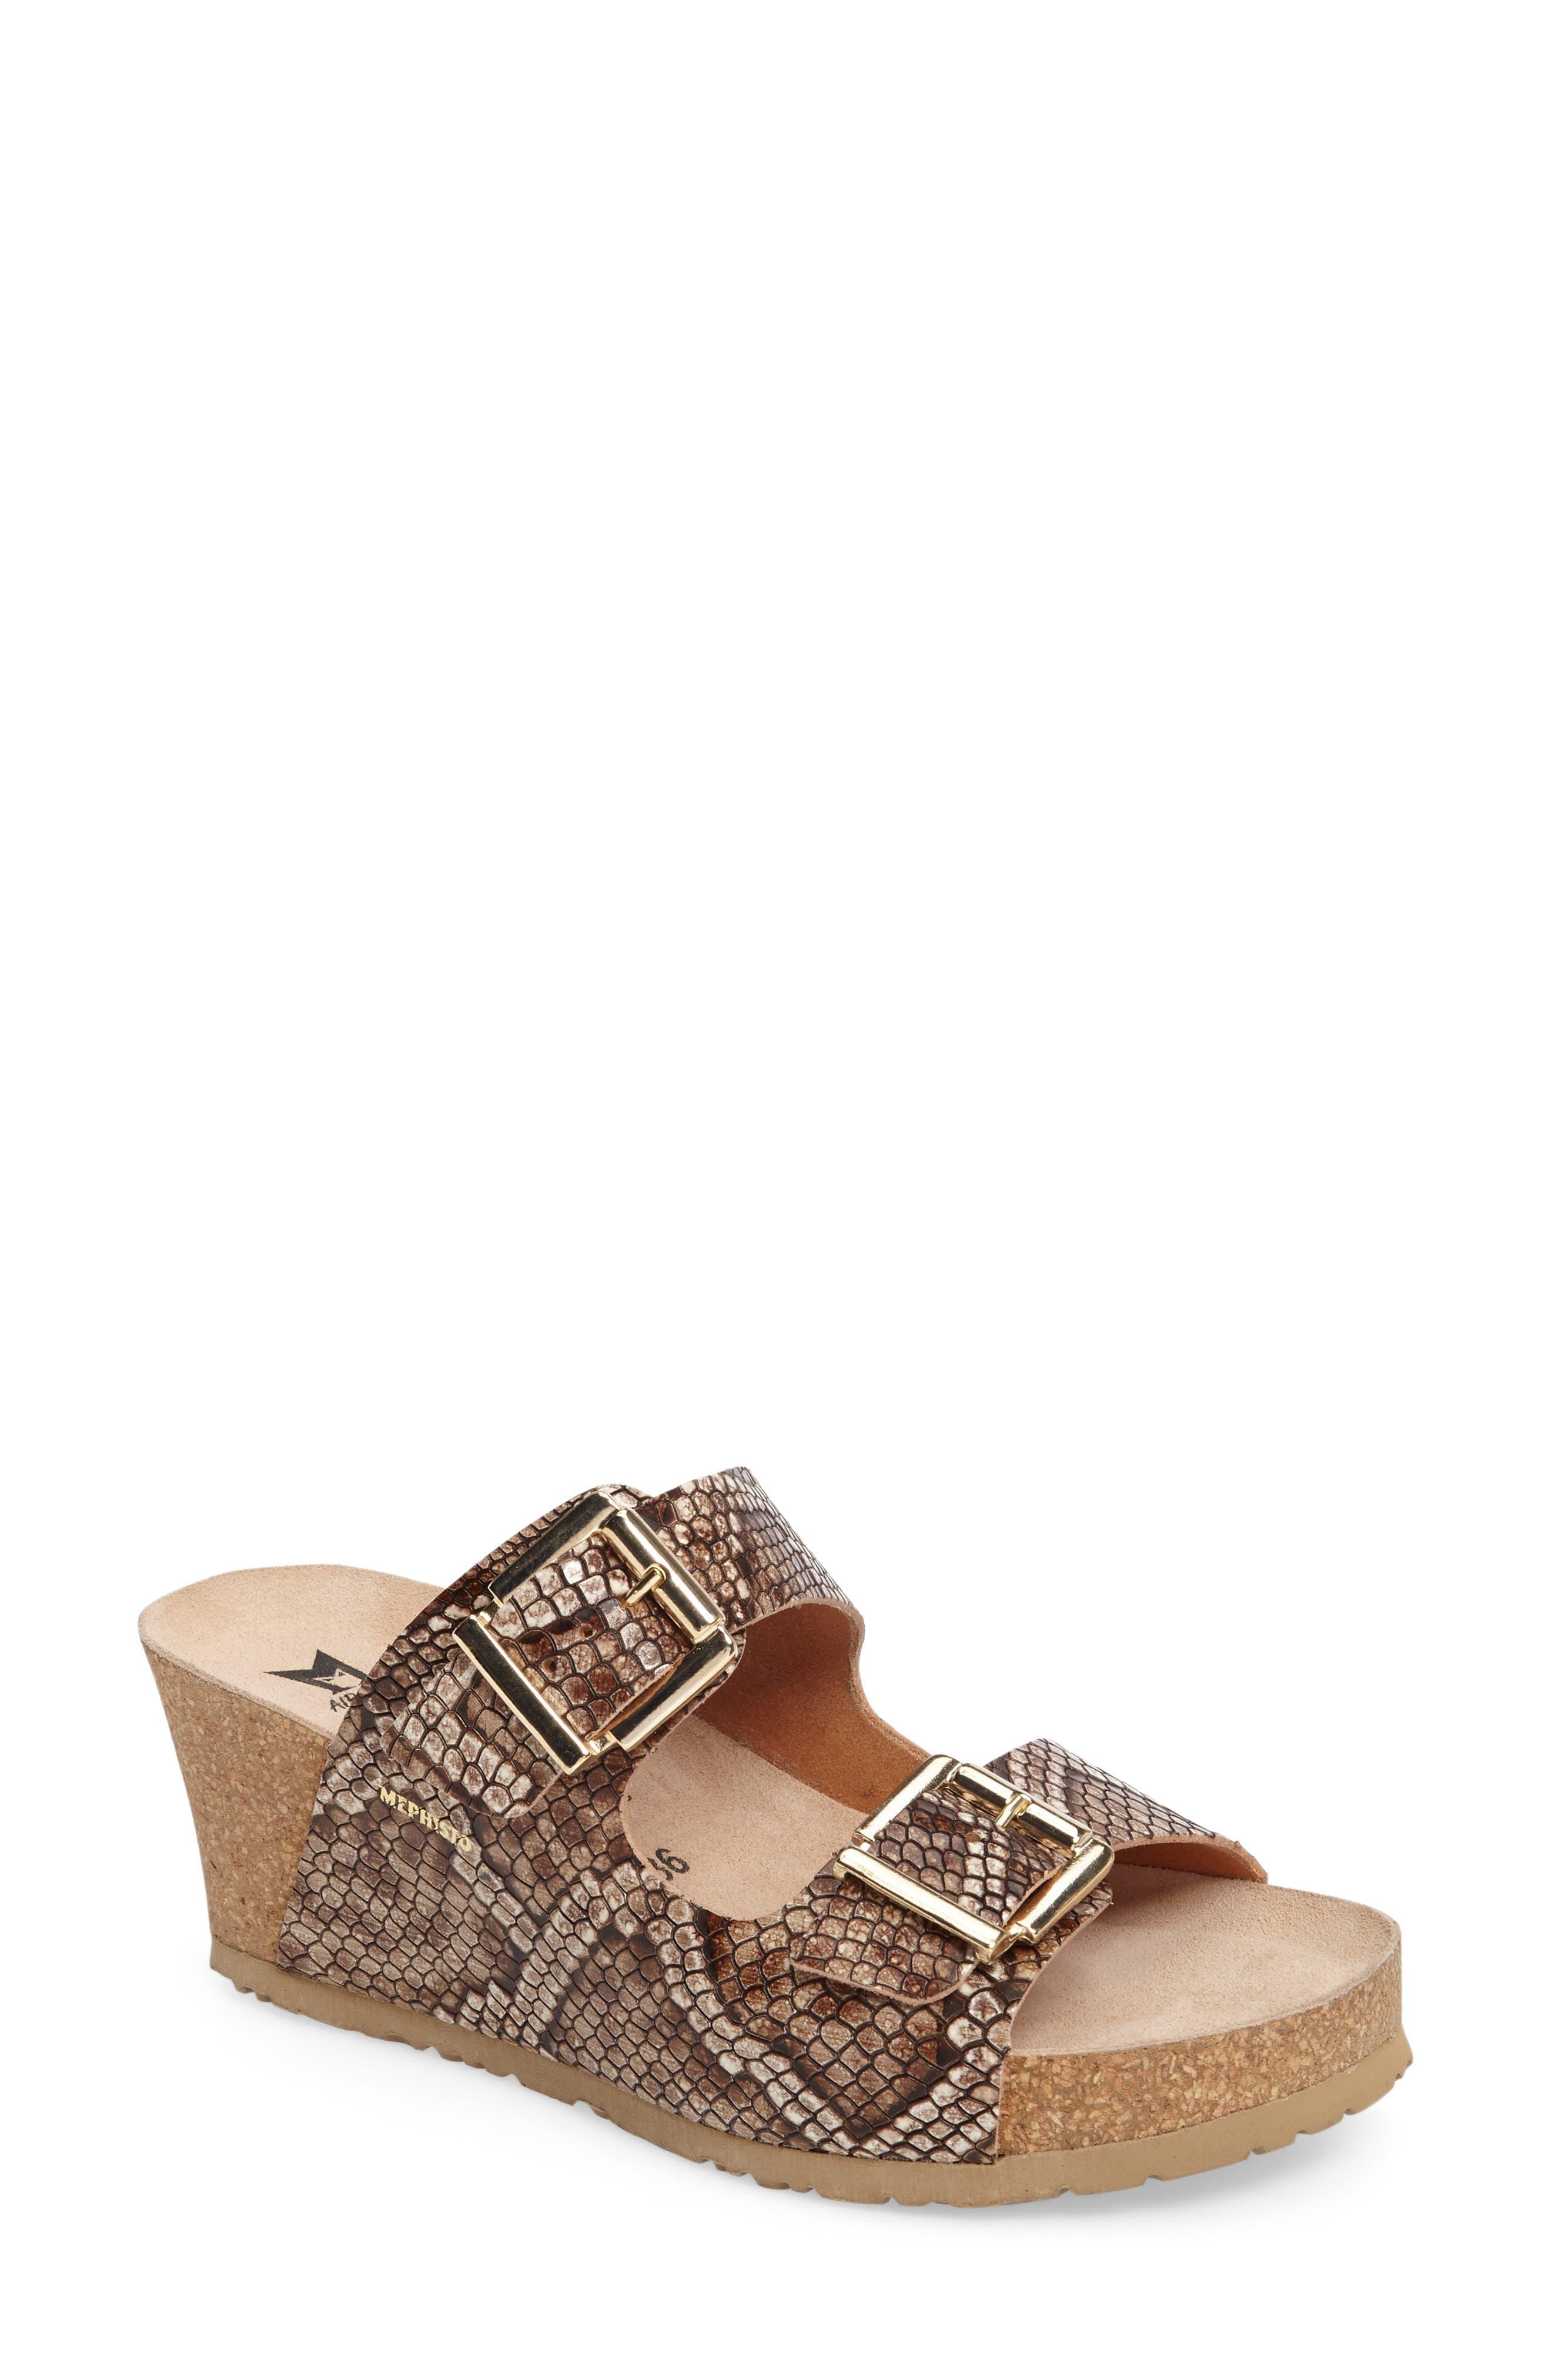 Lenia Wedge Sandal,                         Main,                         color, 209